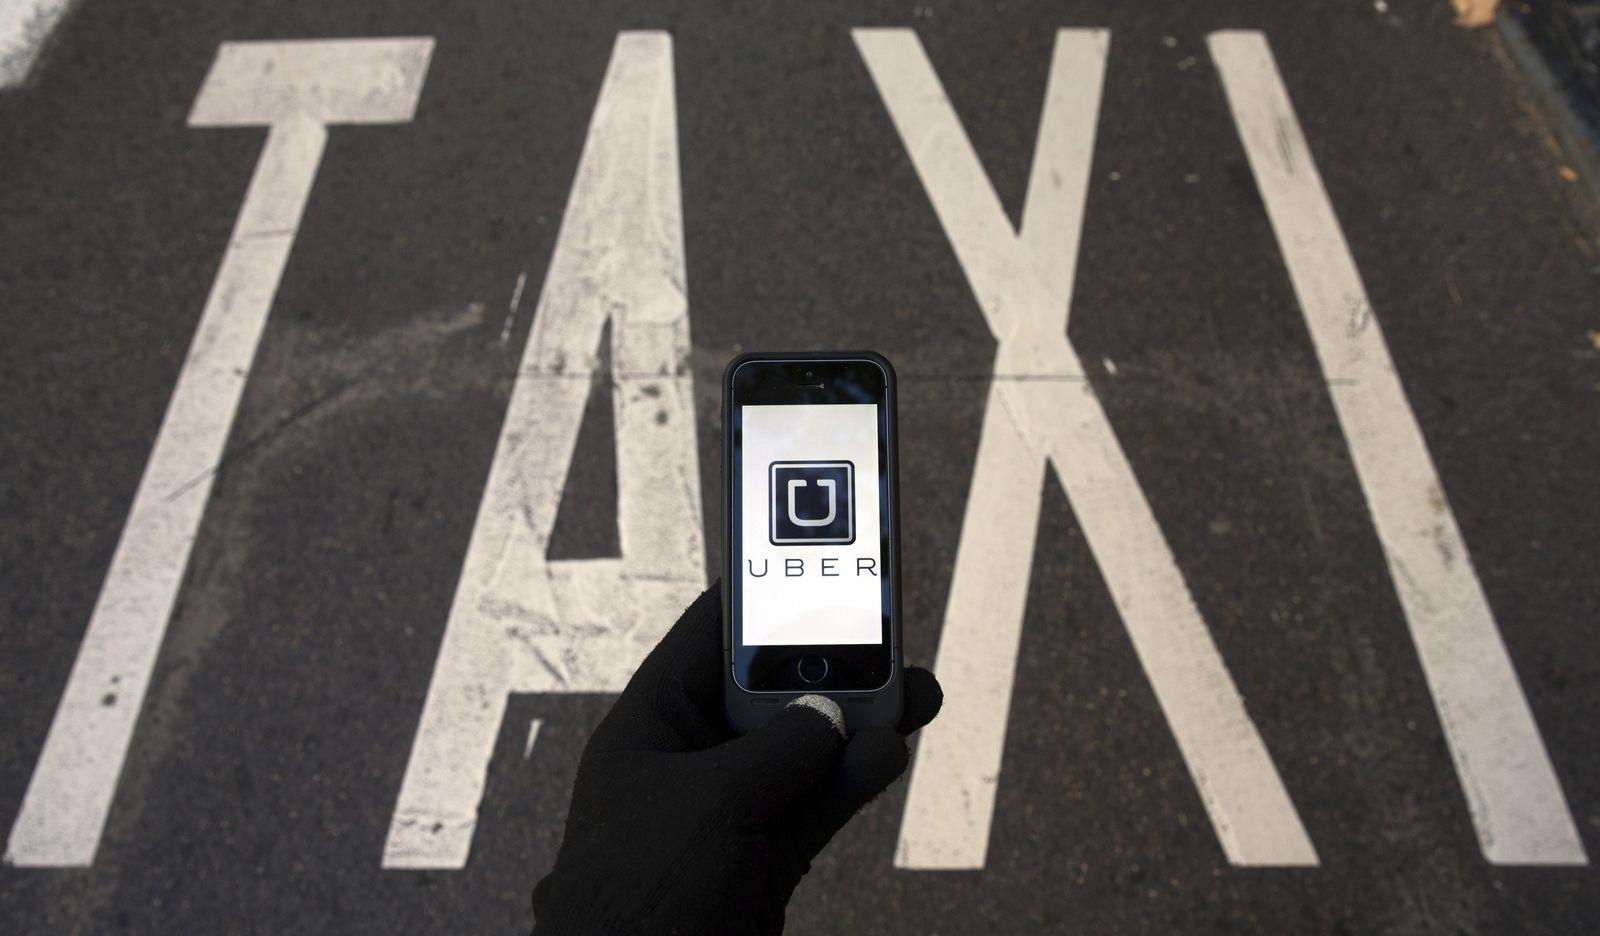 Taxi / Uber / App